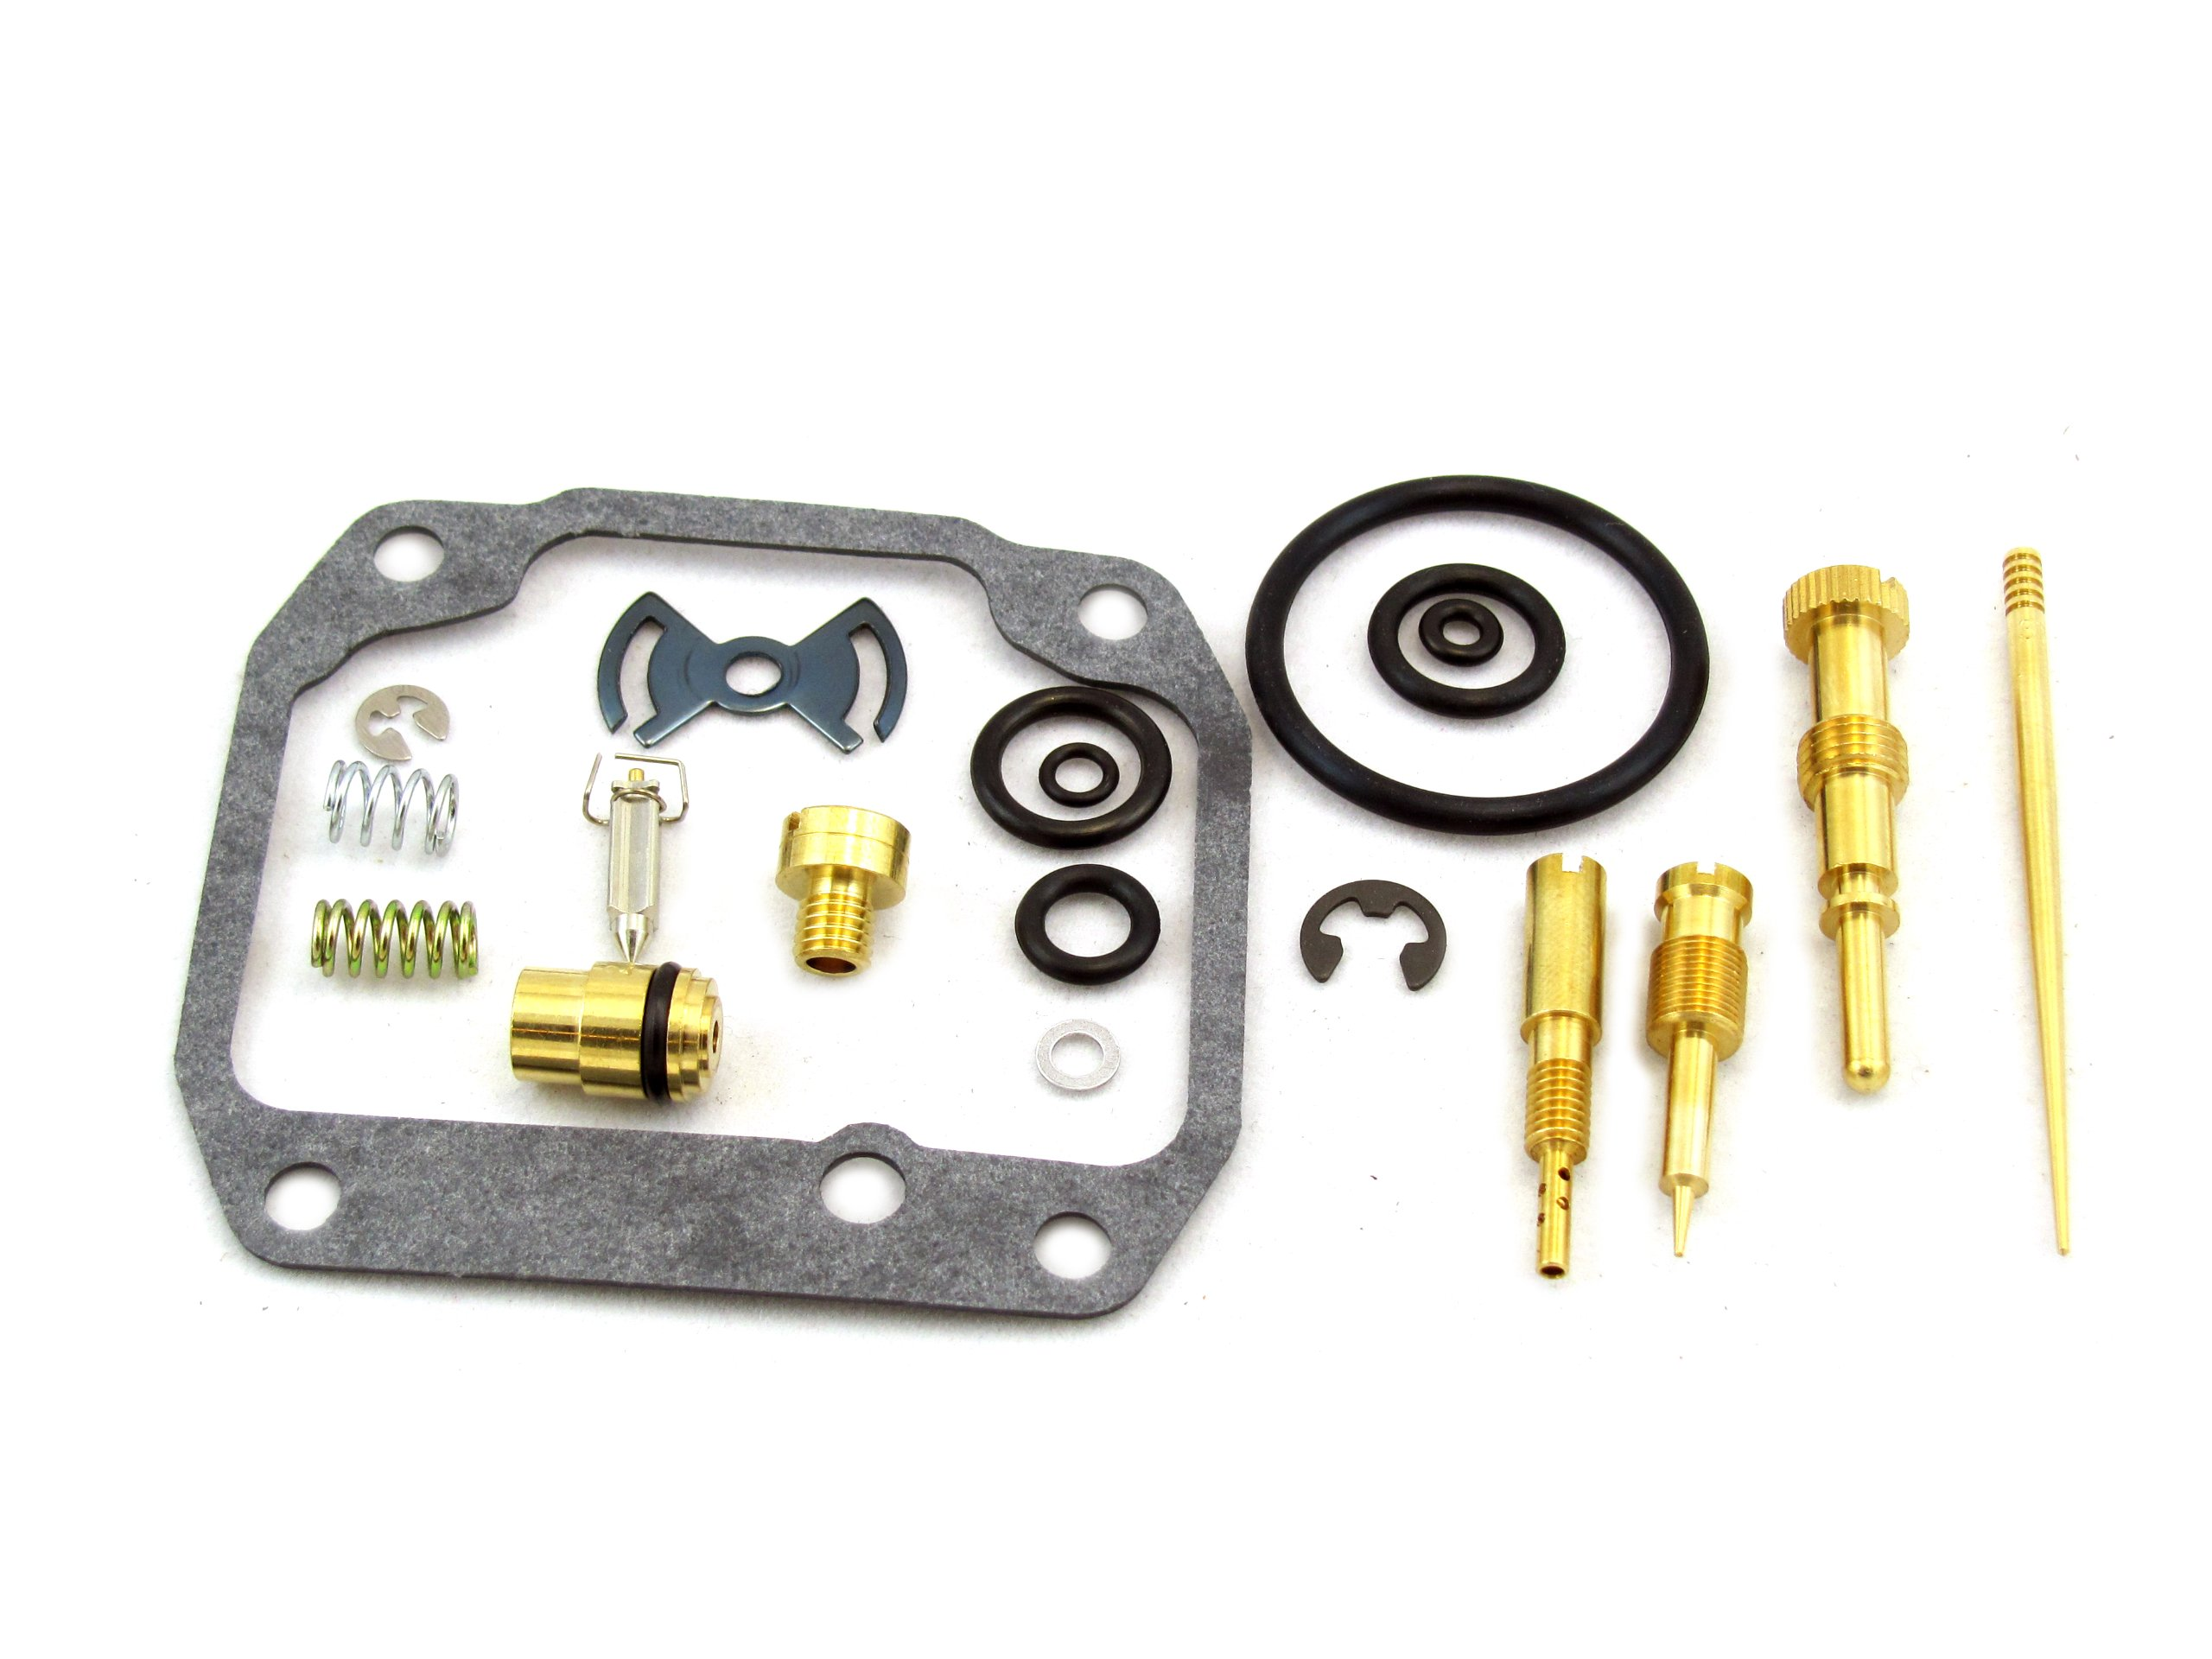 Freedom County ATV FC03202 Carburetor Rebuild Kit for Suzuki LT230 Sport